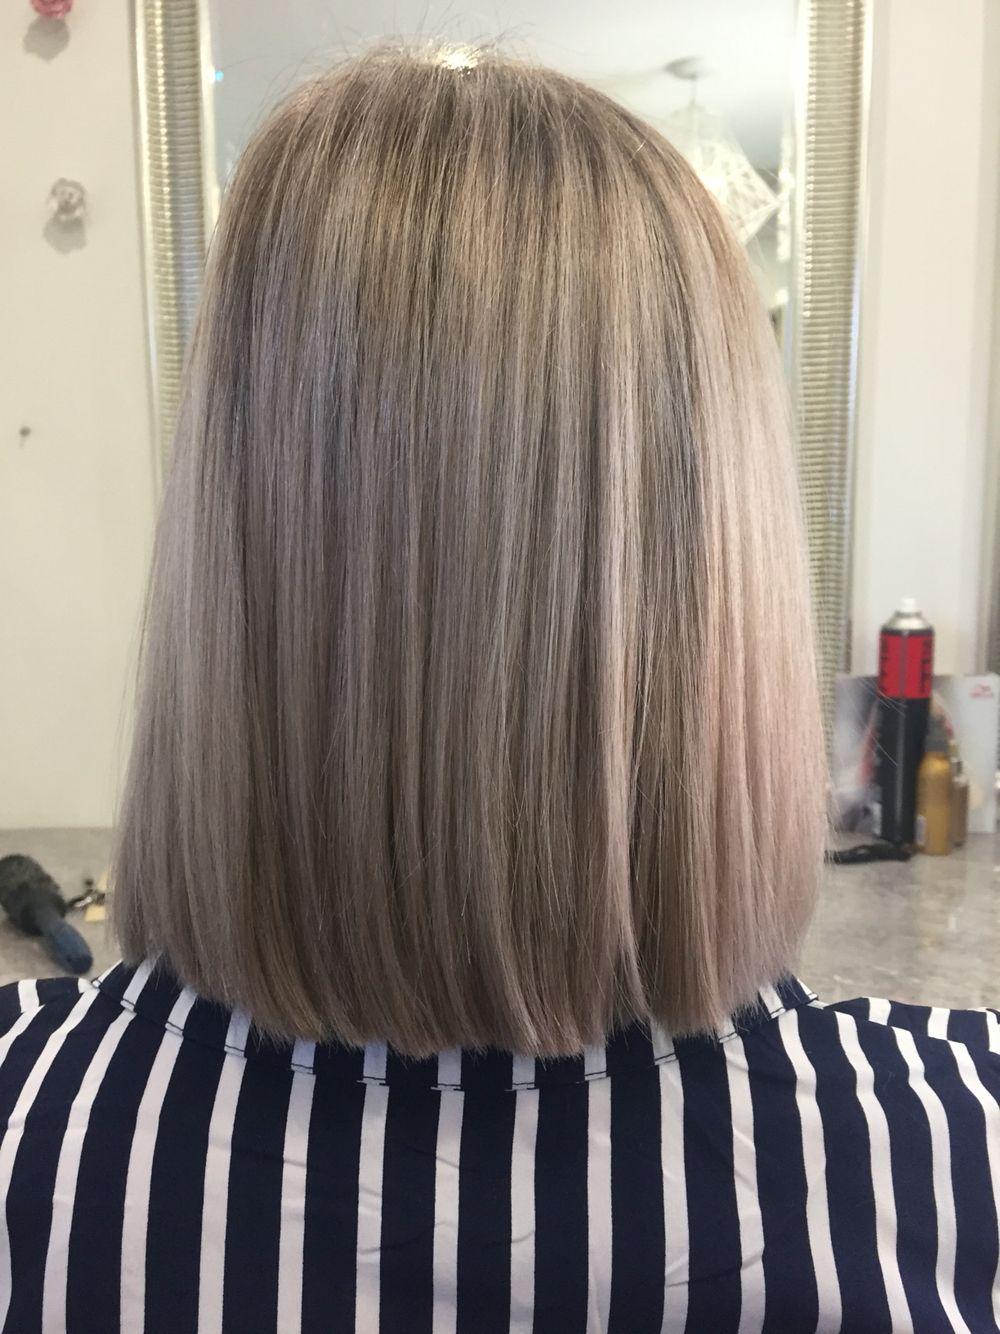 Full head foils with Wella hair colour.. INSTAMATiC toner smokey amethyst  FORMULAS in 2019